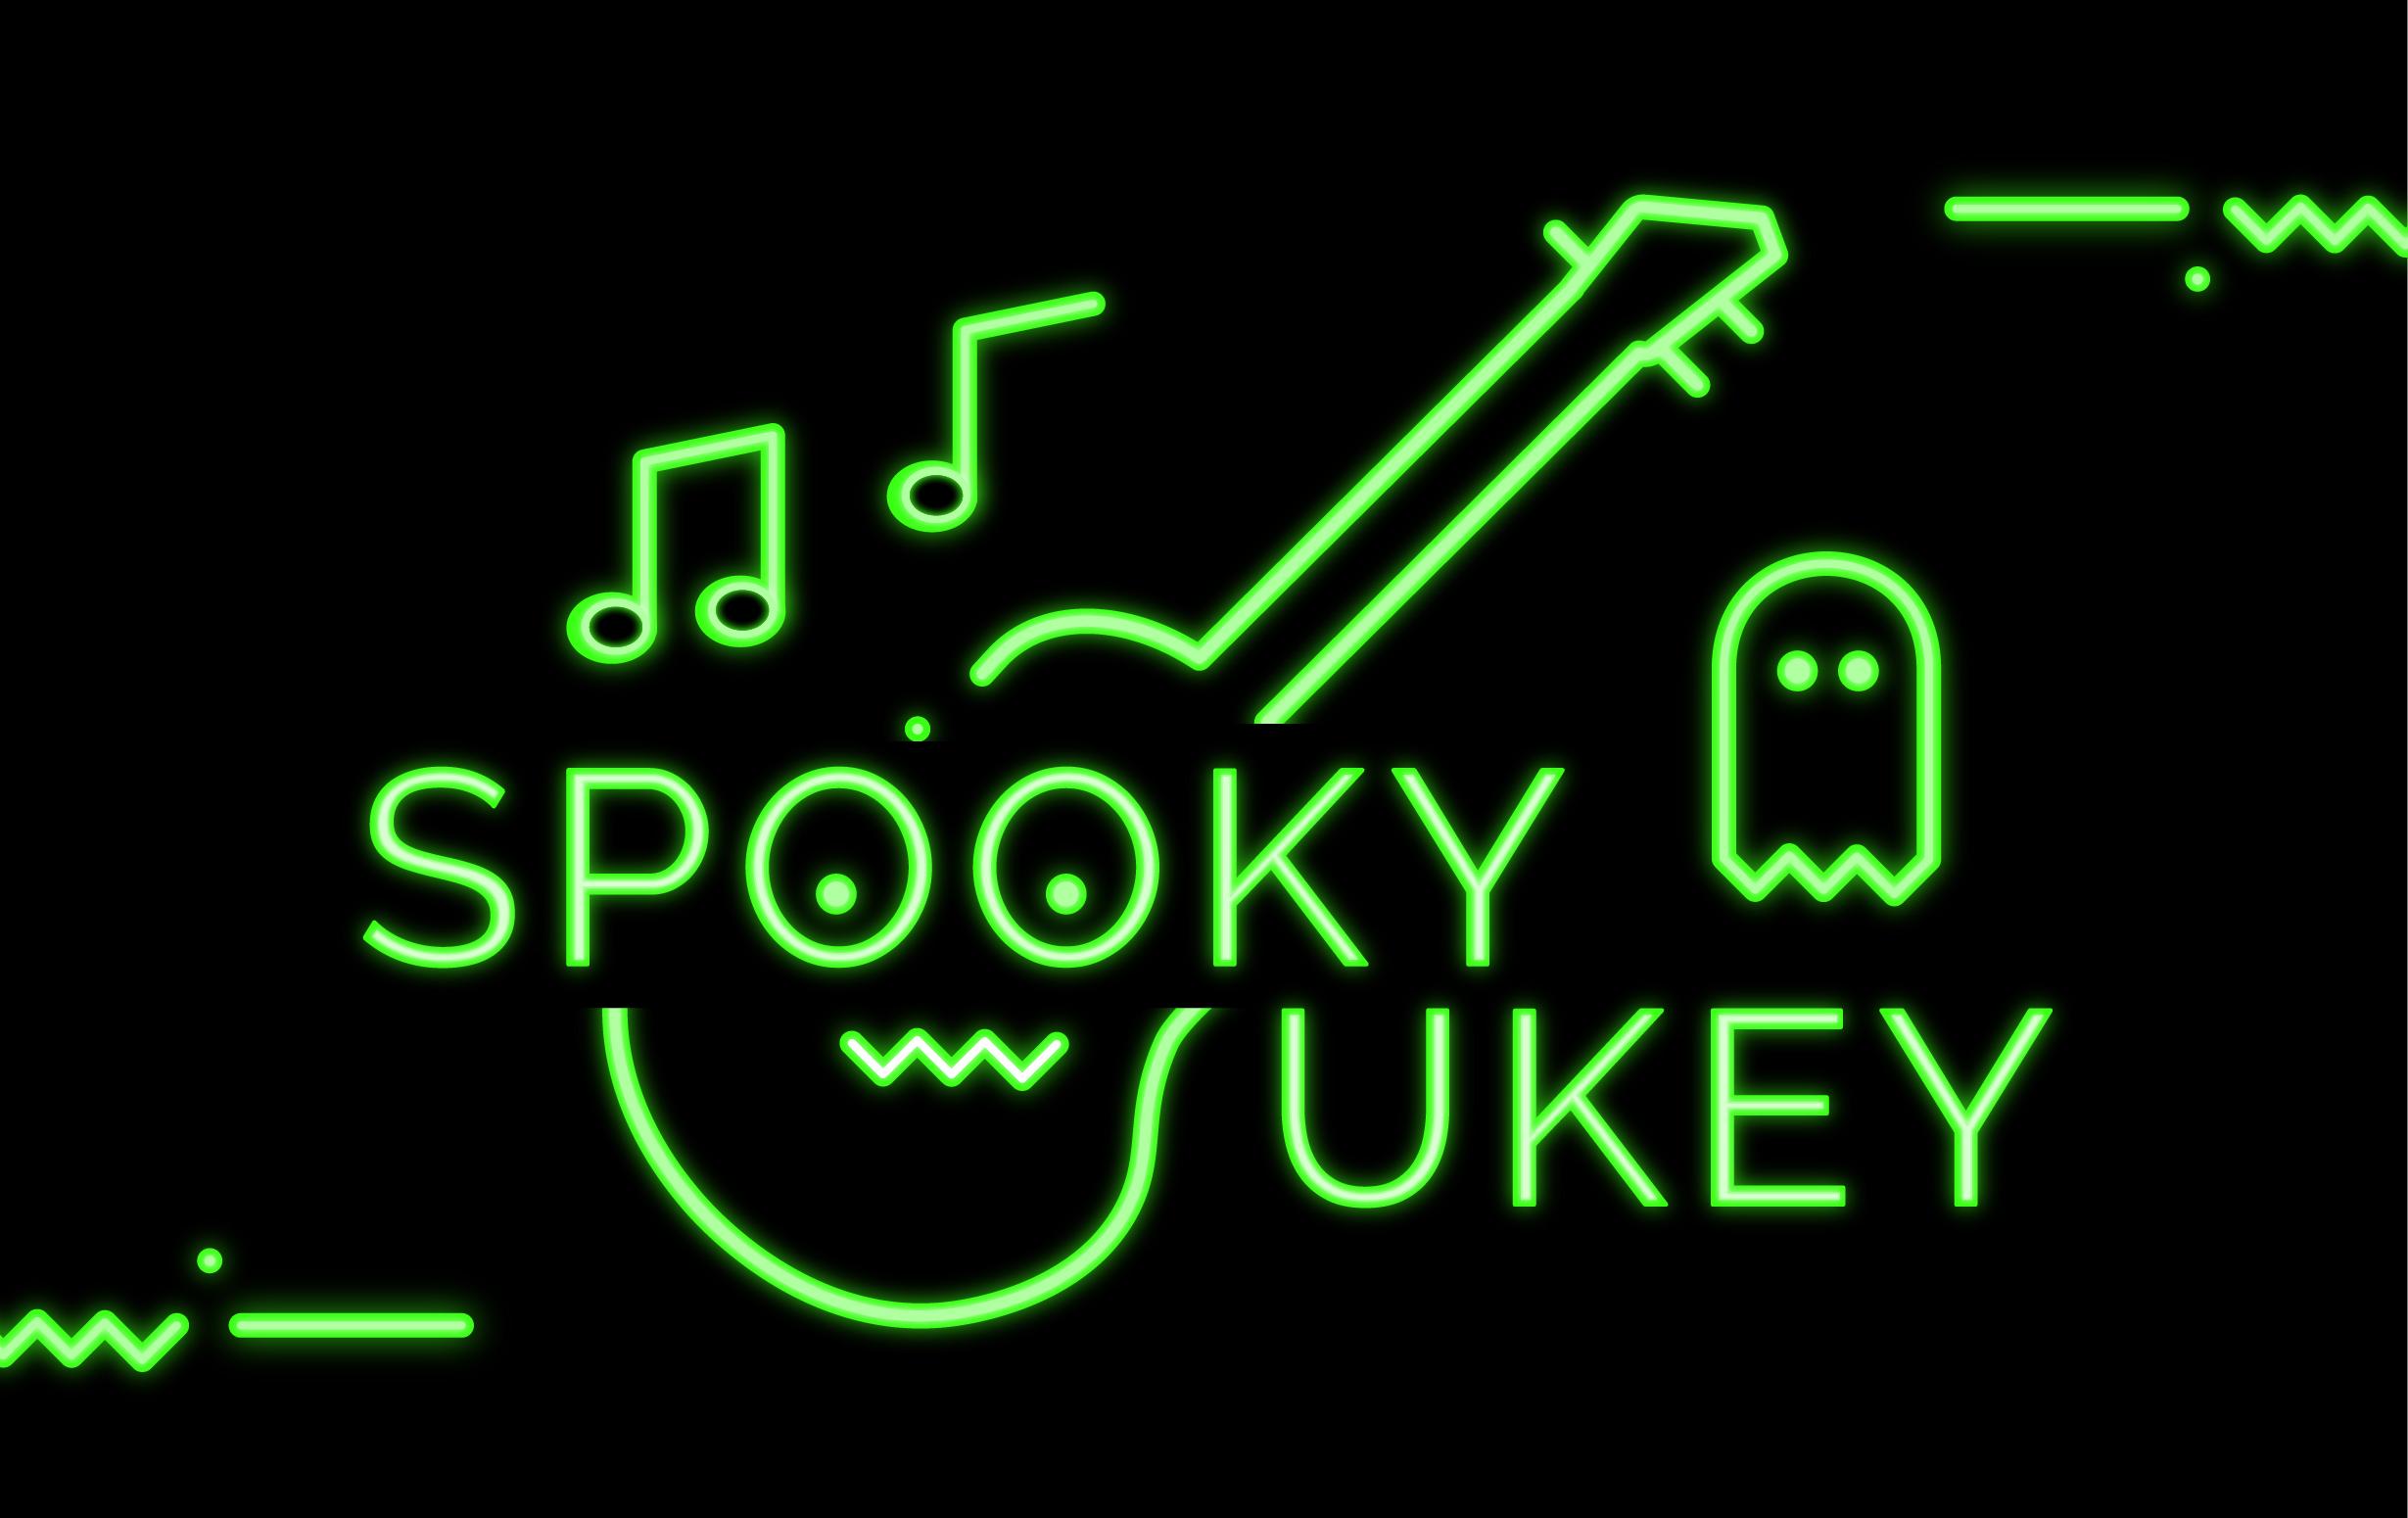 Spooky Ukes-01